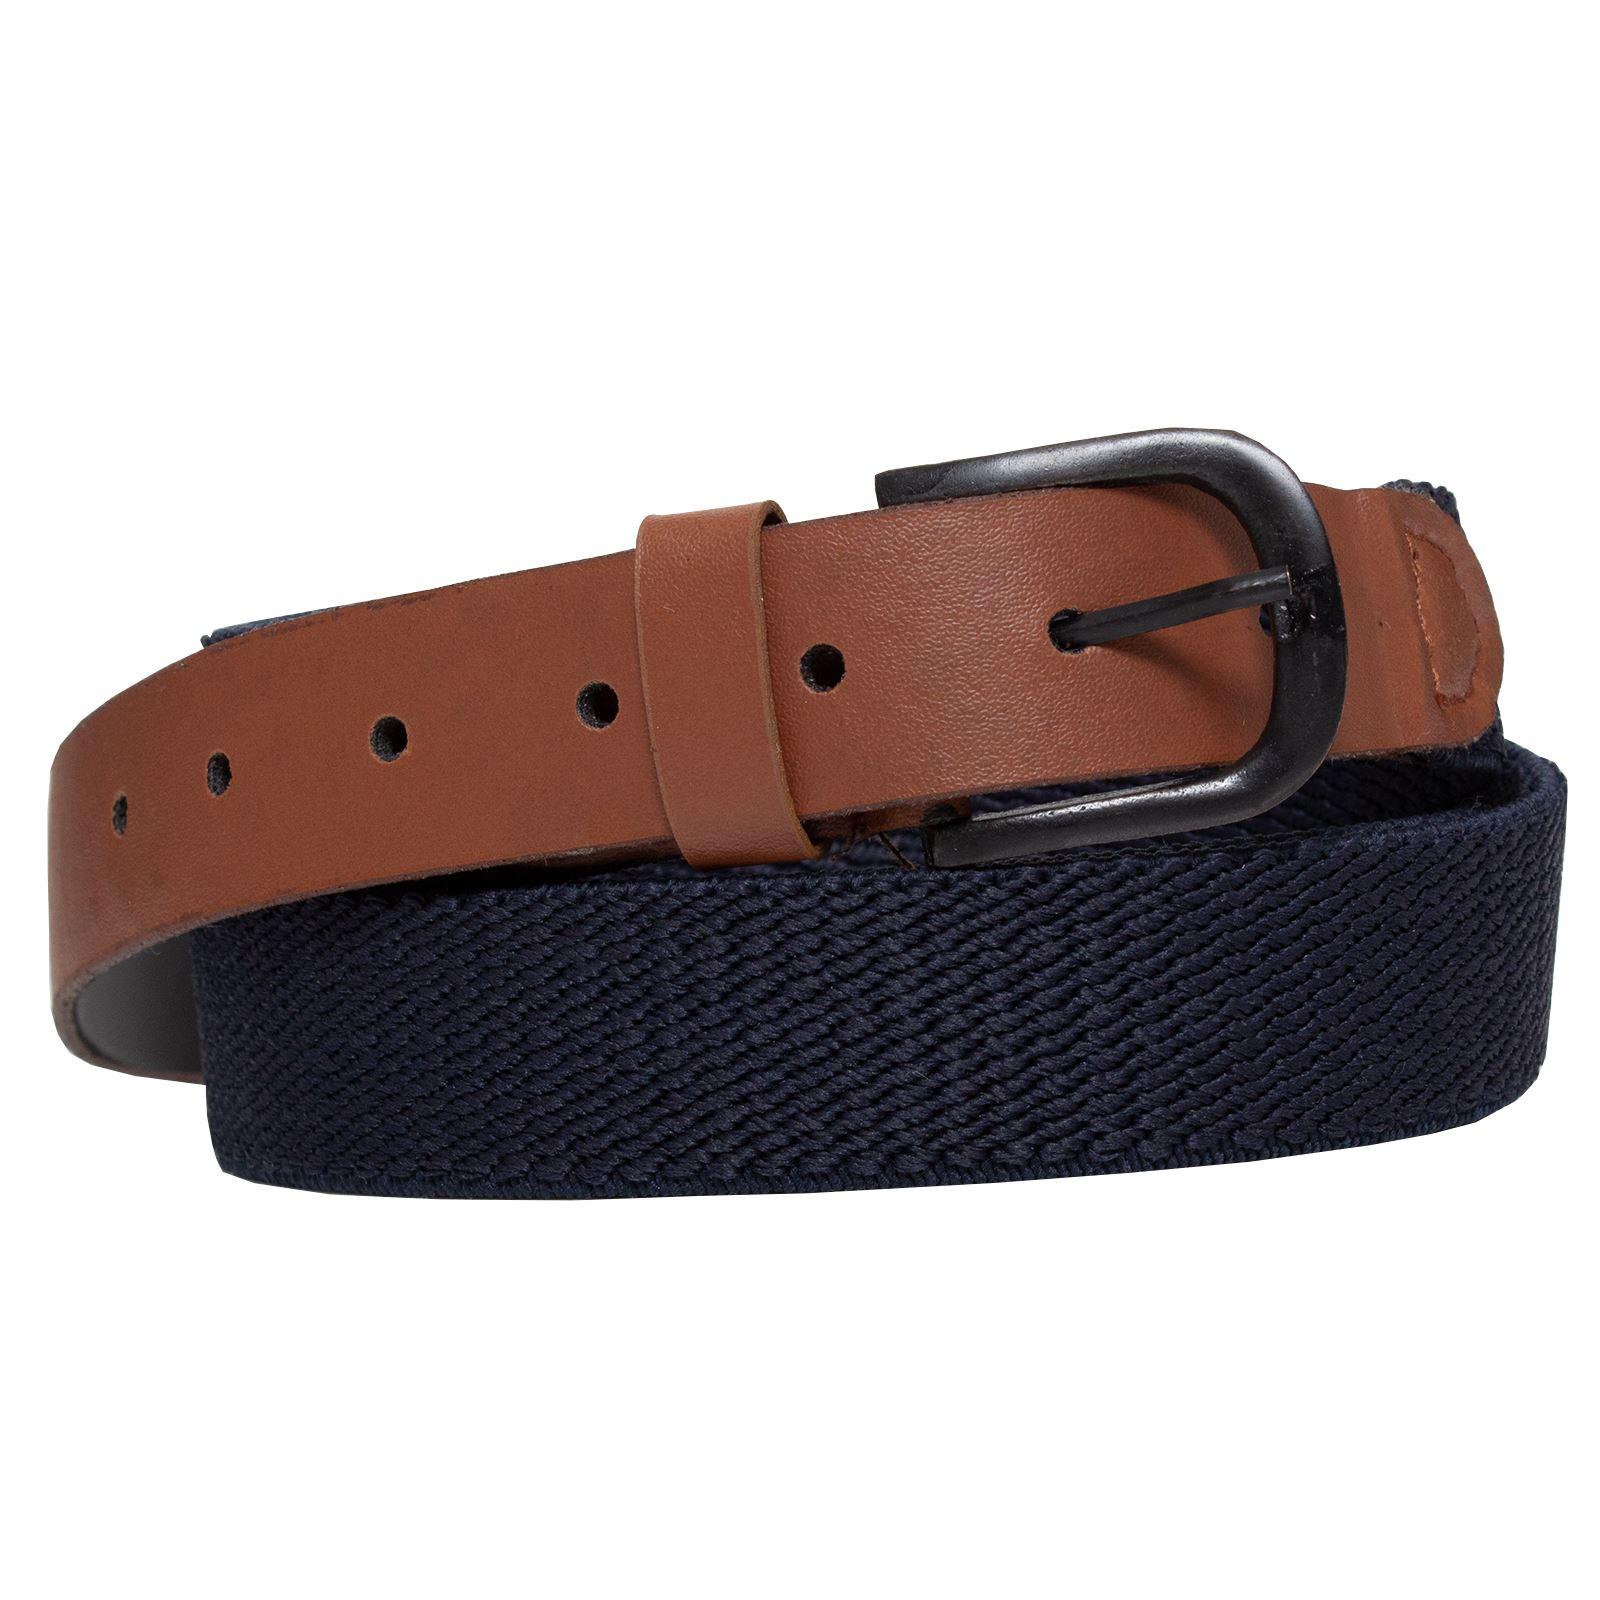 ENZO-Mens-Womens-Elasticated-Belts-Canvas-Stretch-PU-Leather-Trim-Braided-Belt Indexbild 4